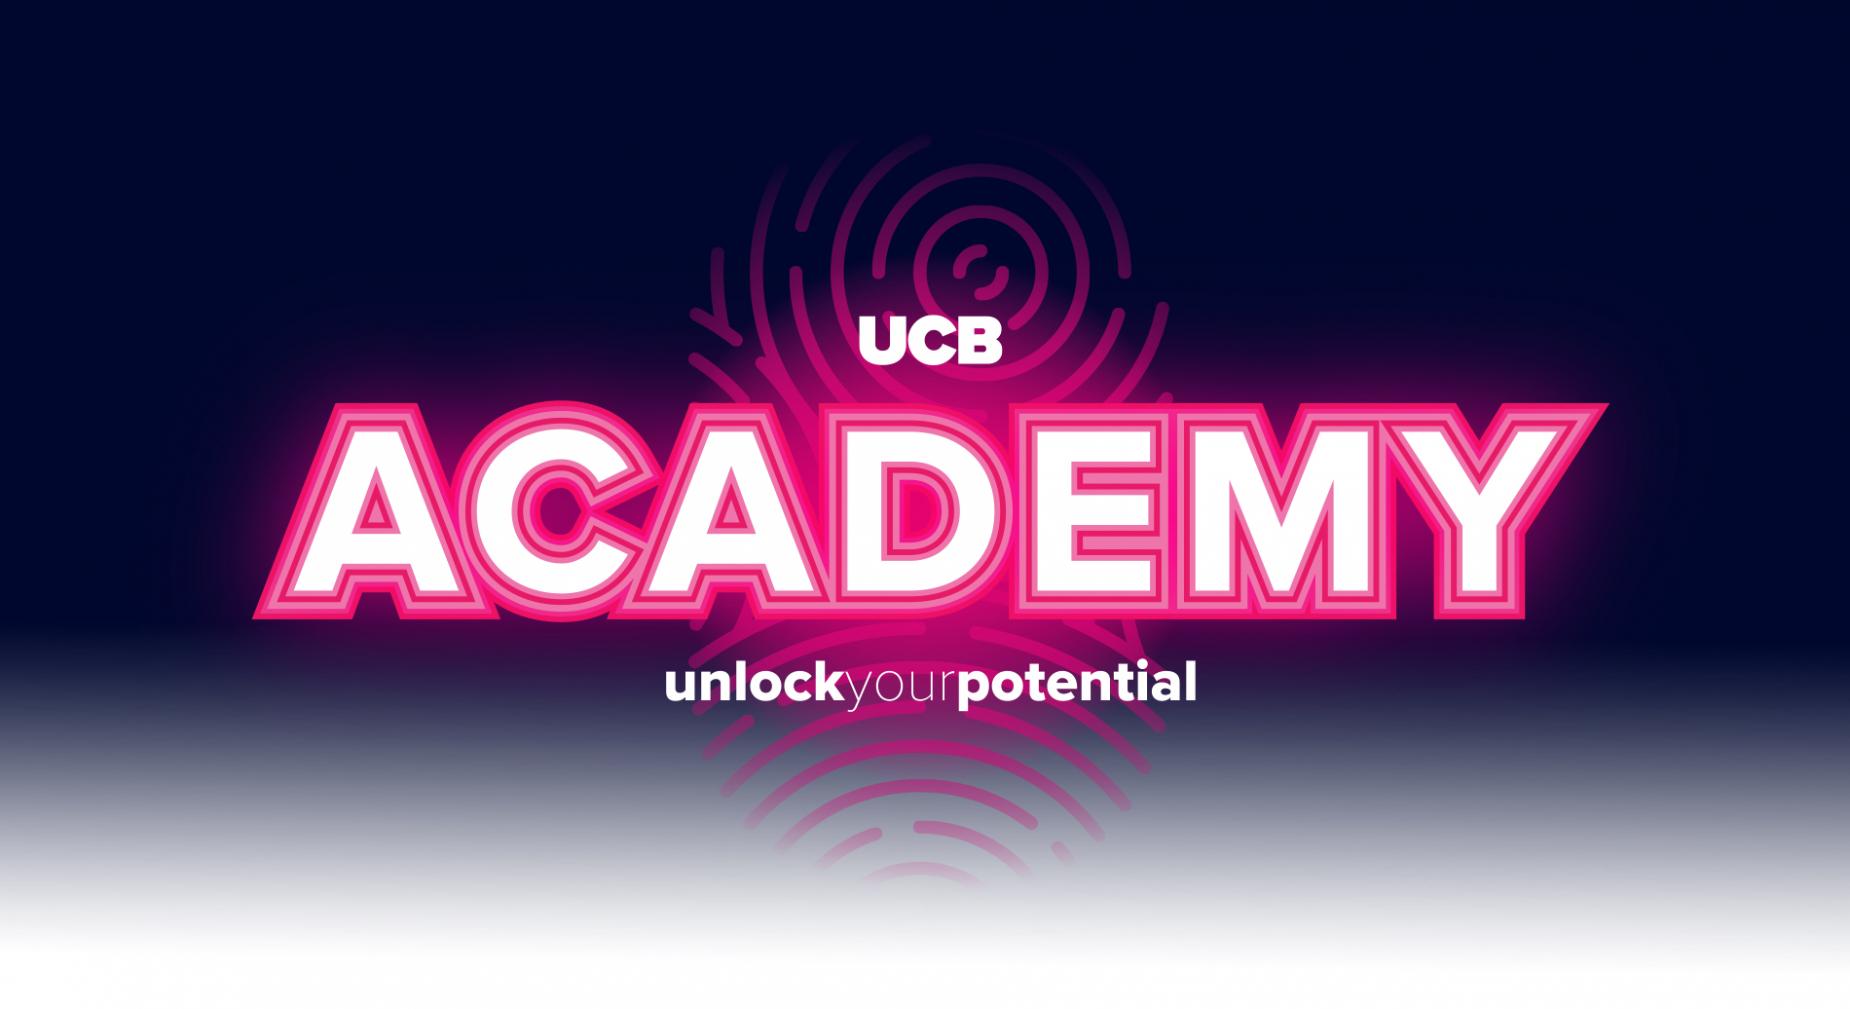 UCB Academy - Unlock your potential